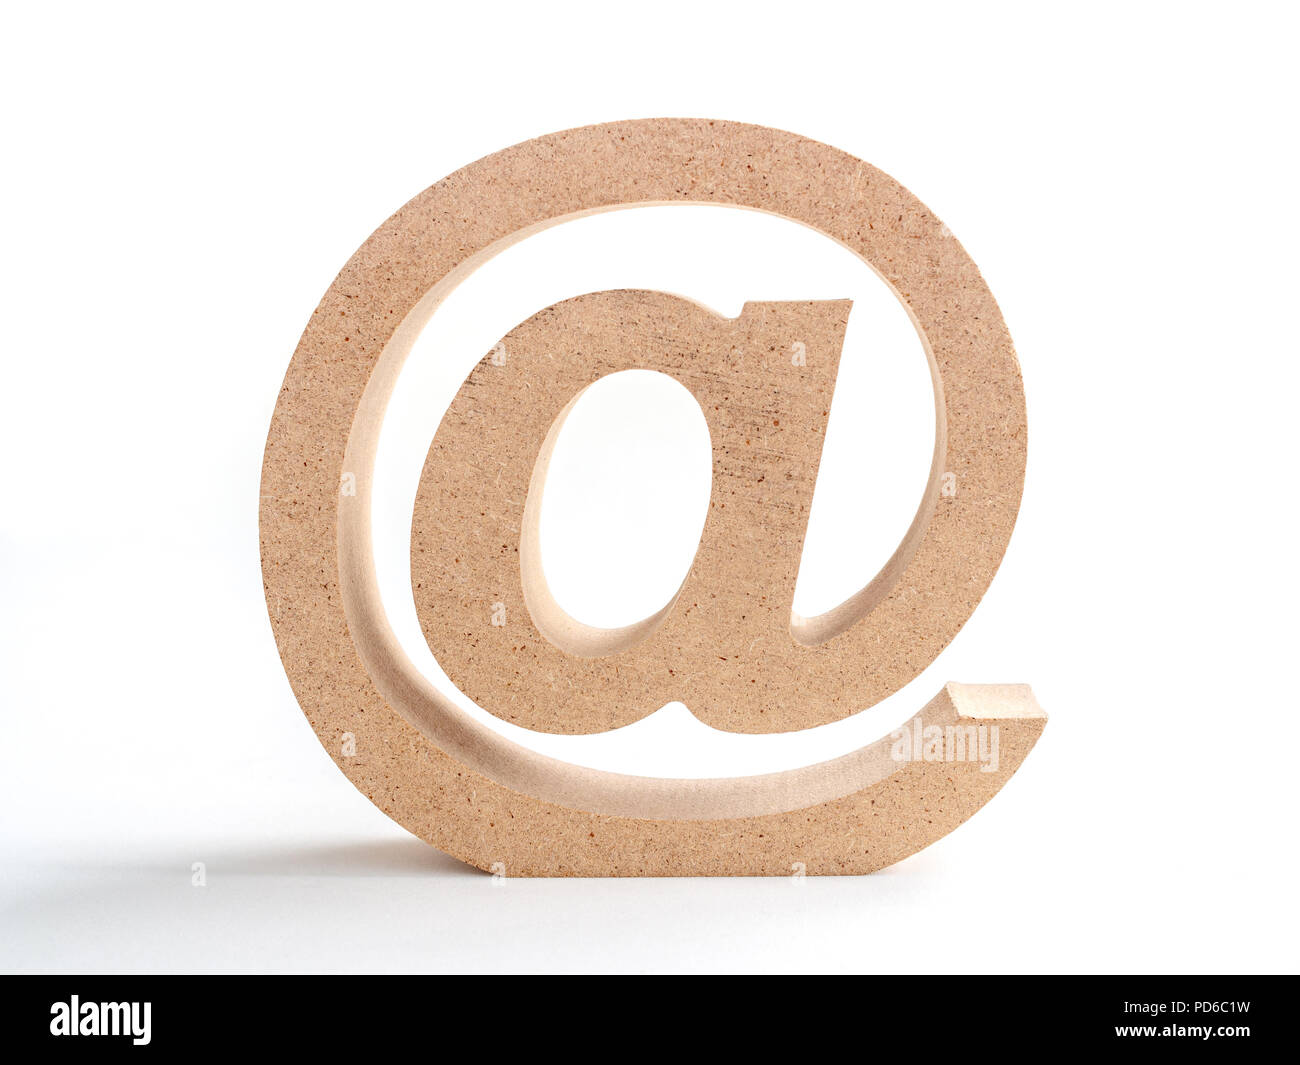 Wooden E-mail address symbol, arroba icon isolated on white